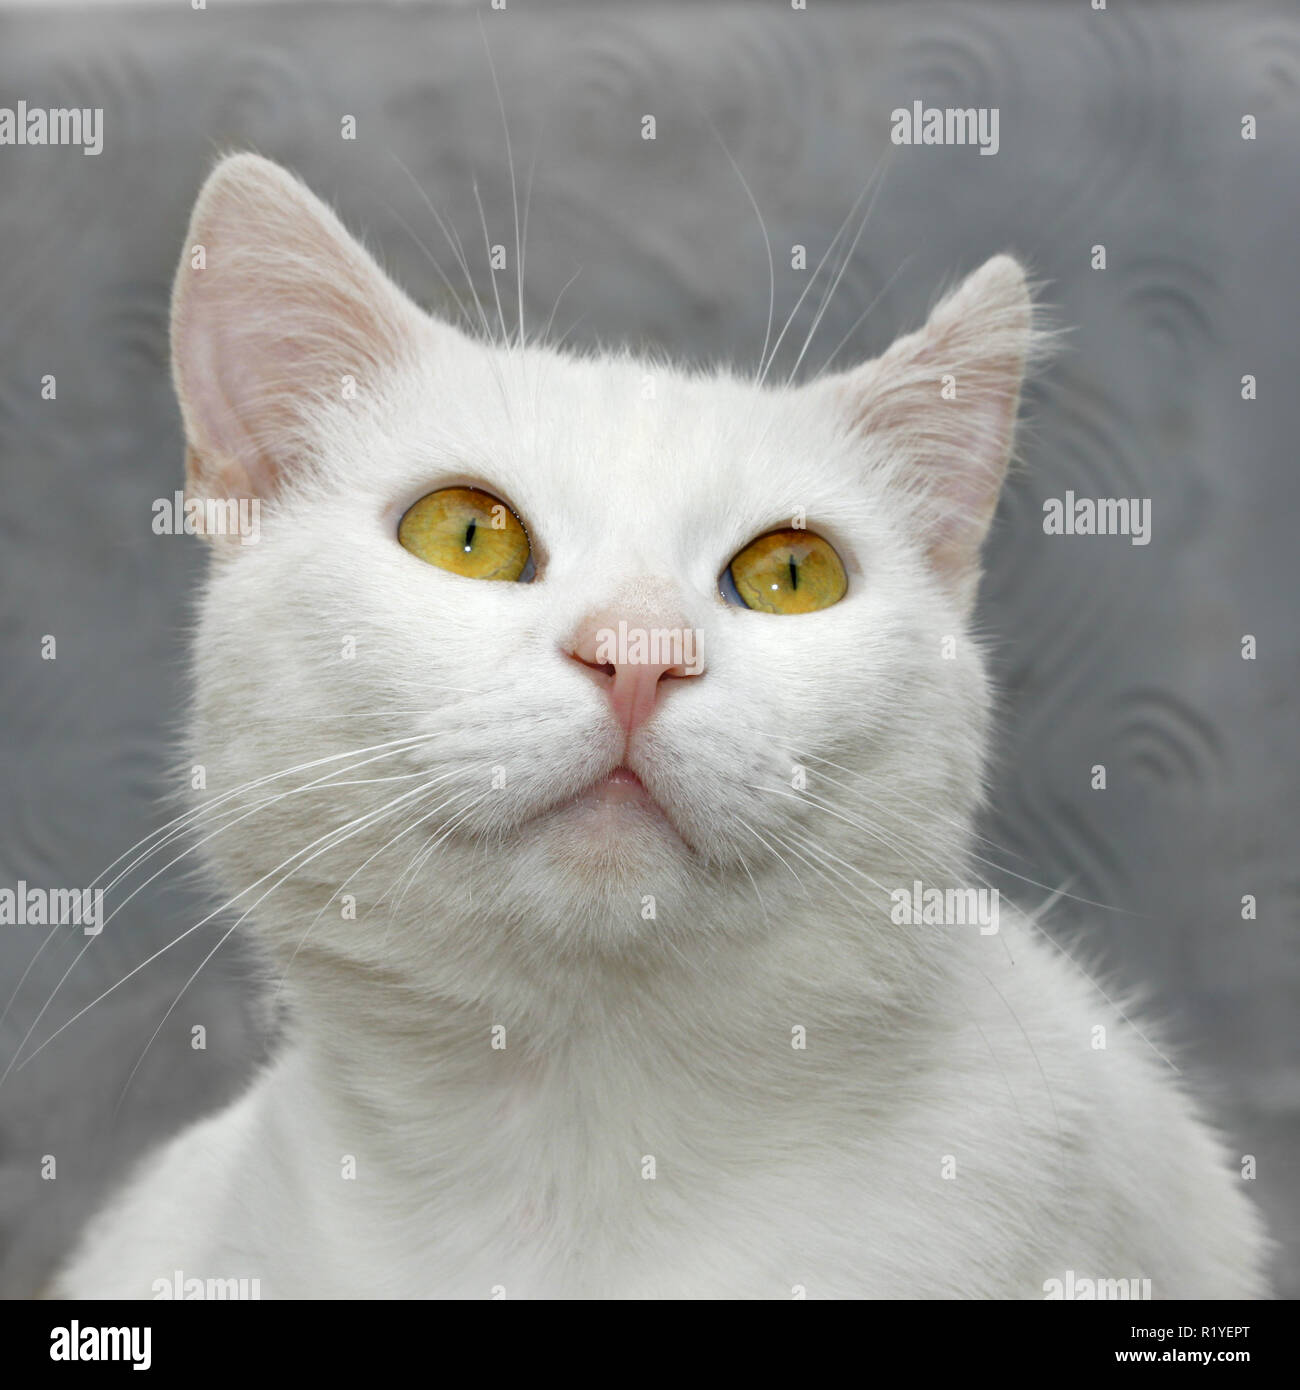 Retrato de un blanco lindo gato doméstico de cerca sobre un fondo de pared gris Imagen De Stock